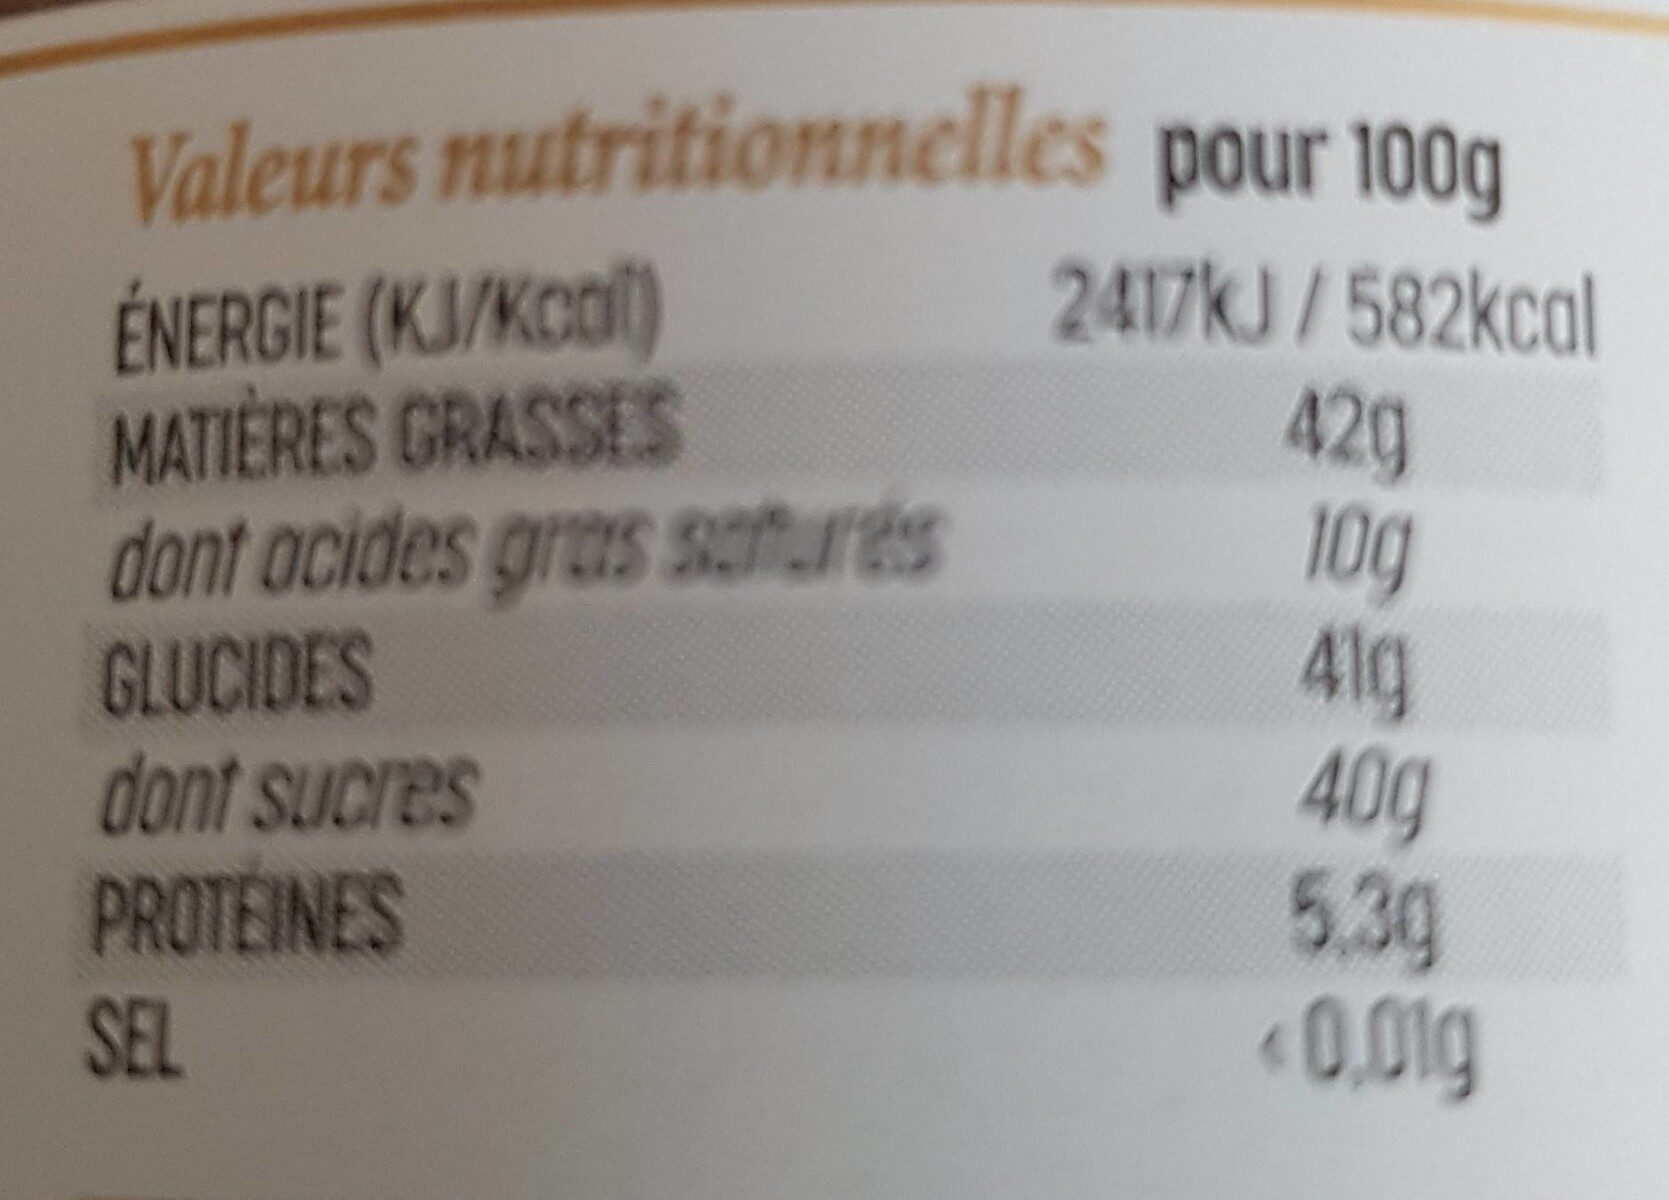 Pâte à tartiner cacao et Grués de cacao - Nährwertangaben - fr